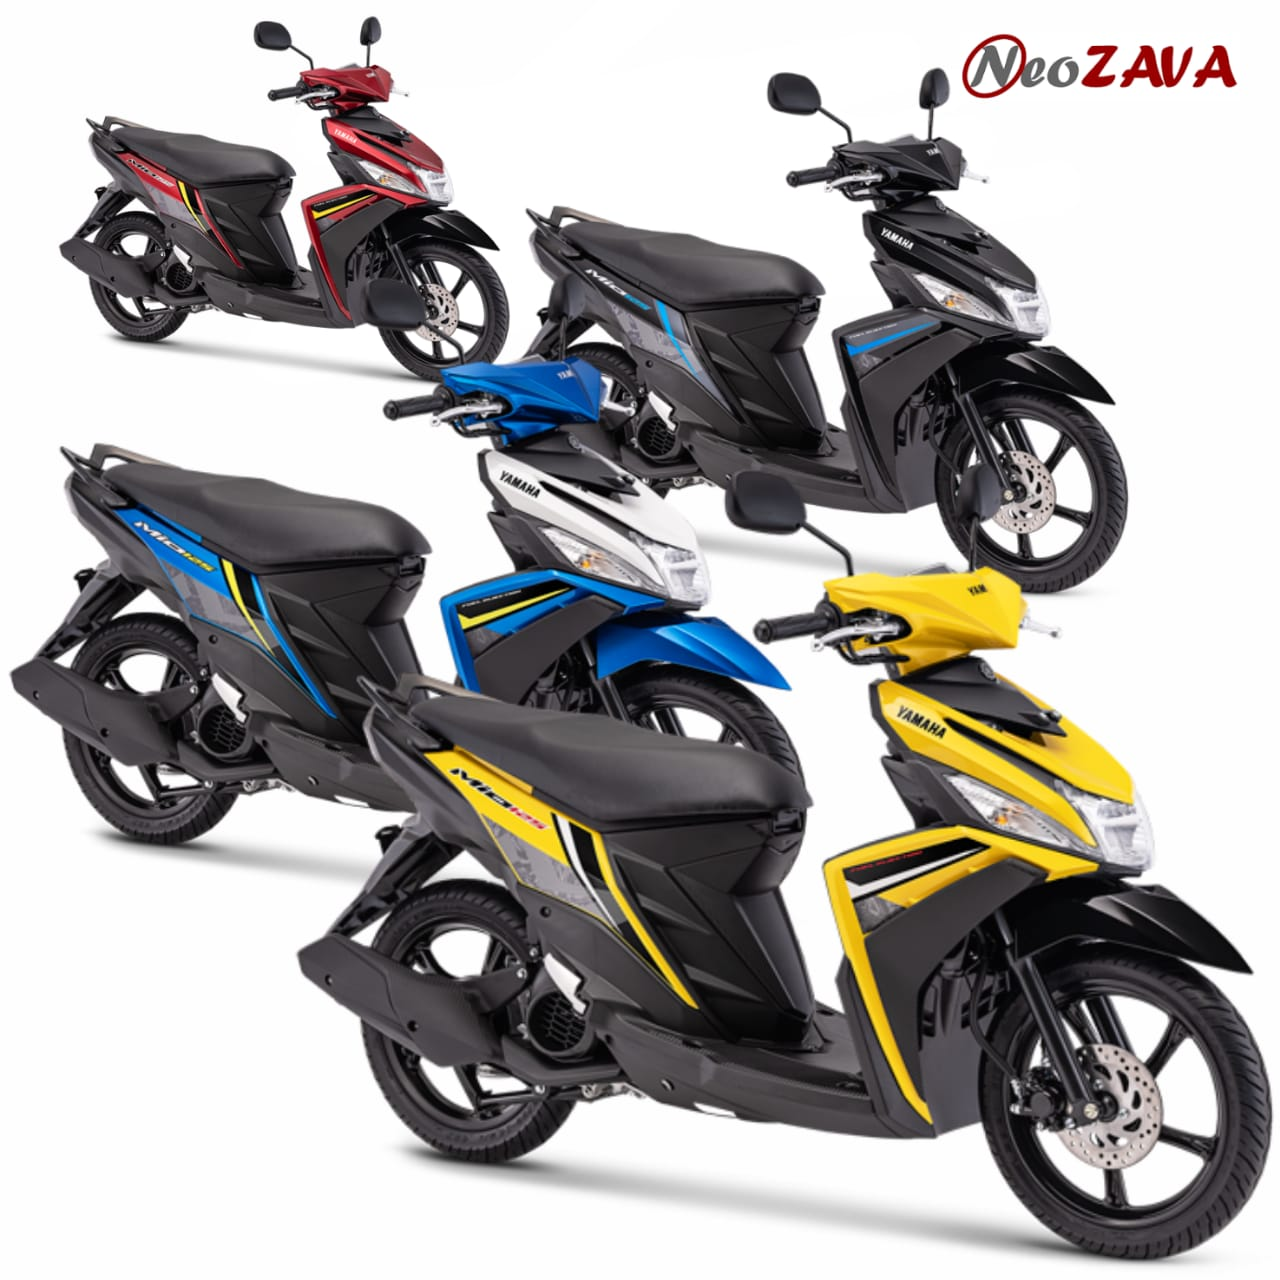 Neozava Yamaha Bogor Mio M3 Cw